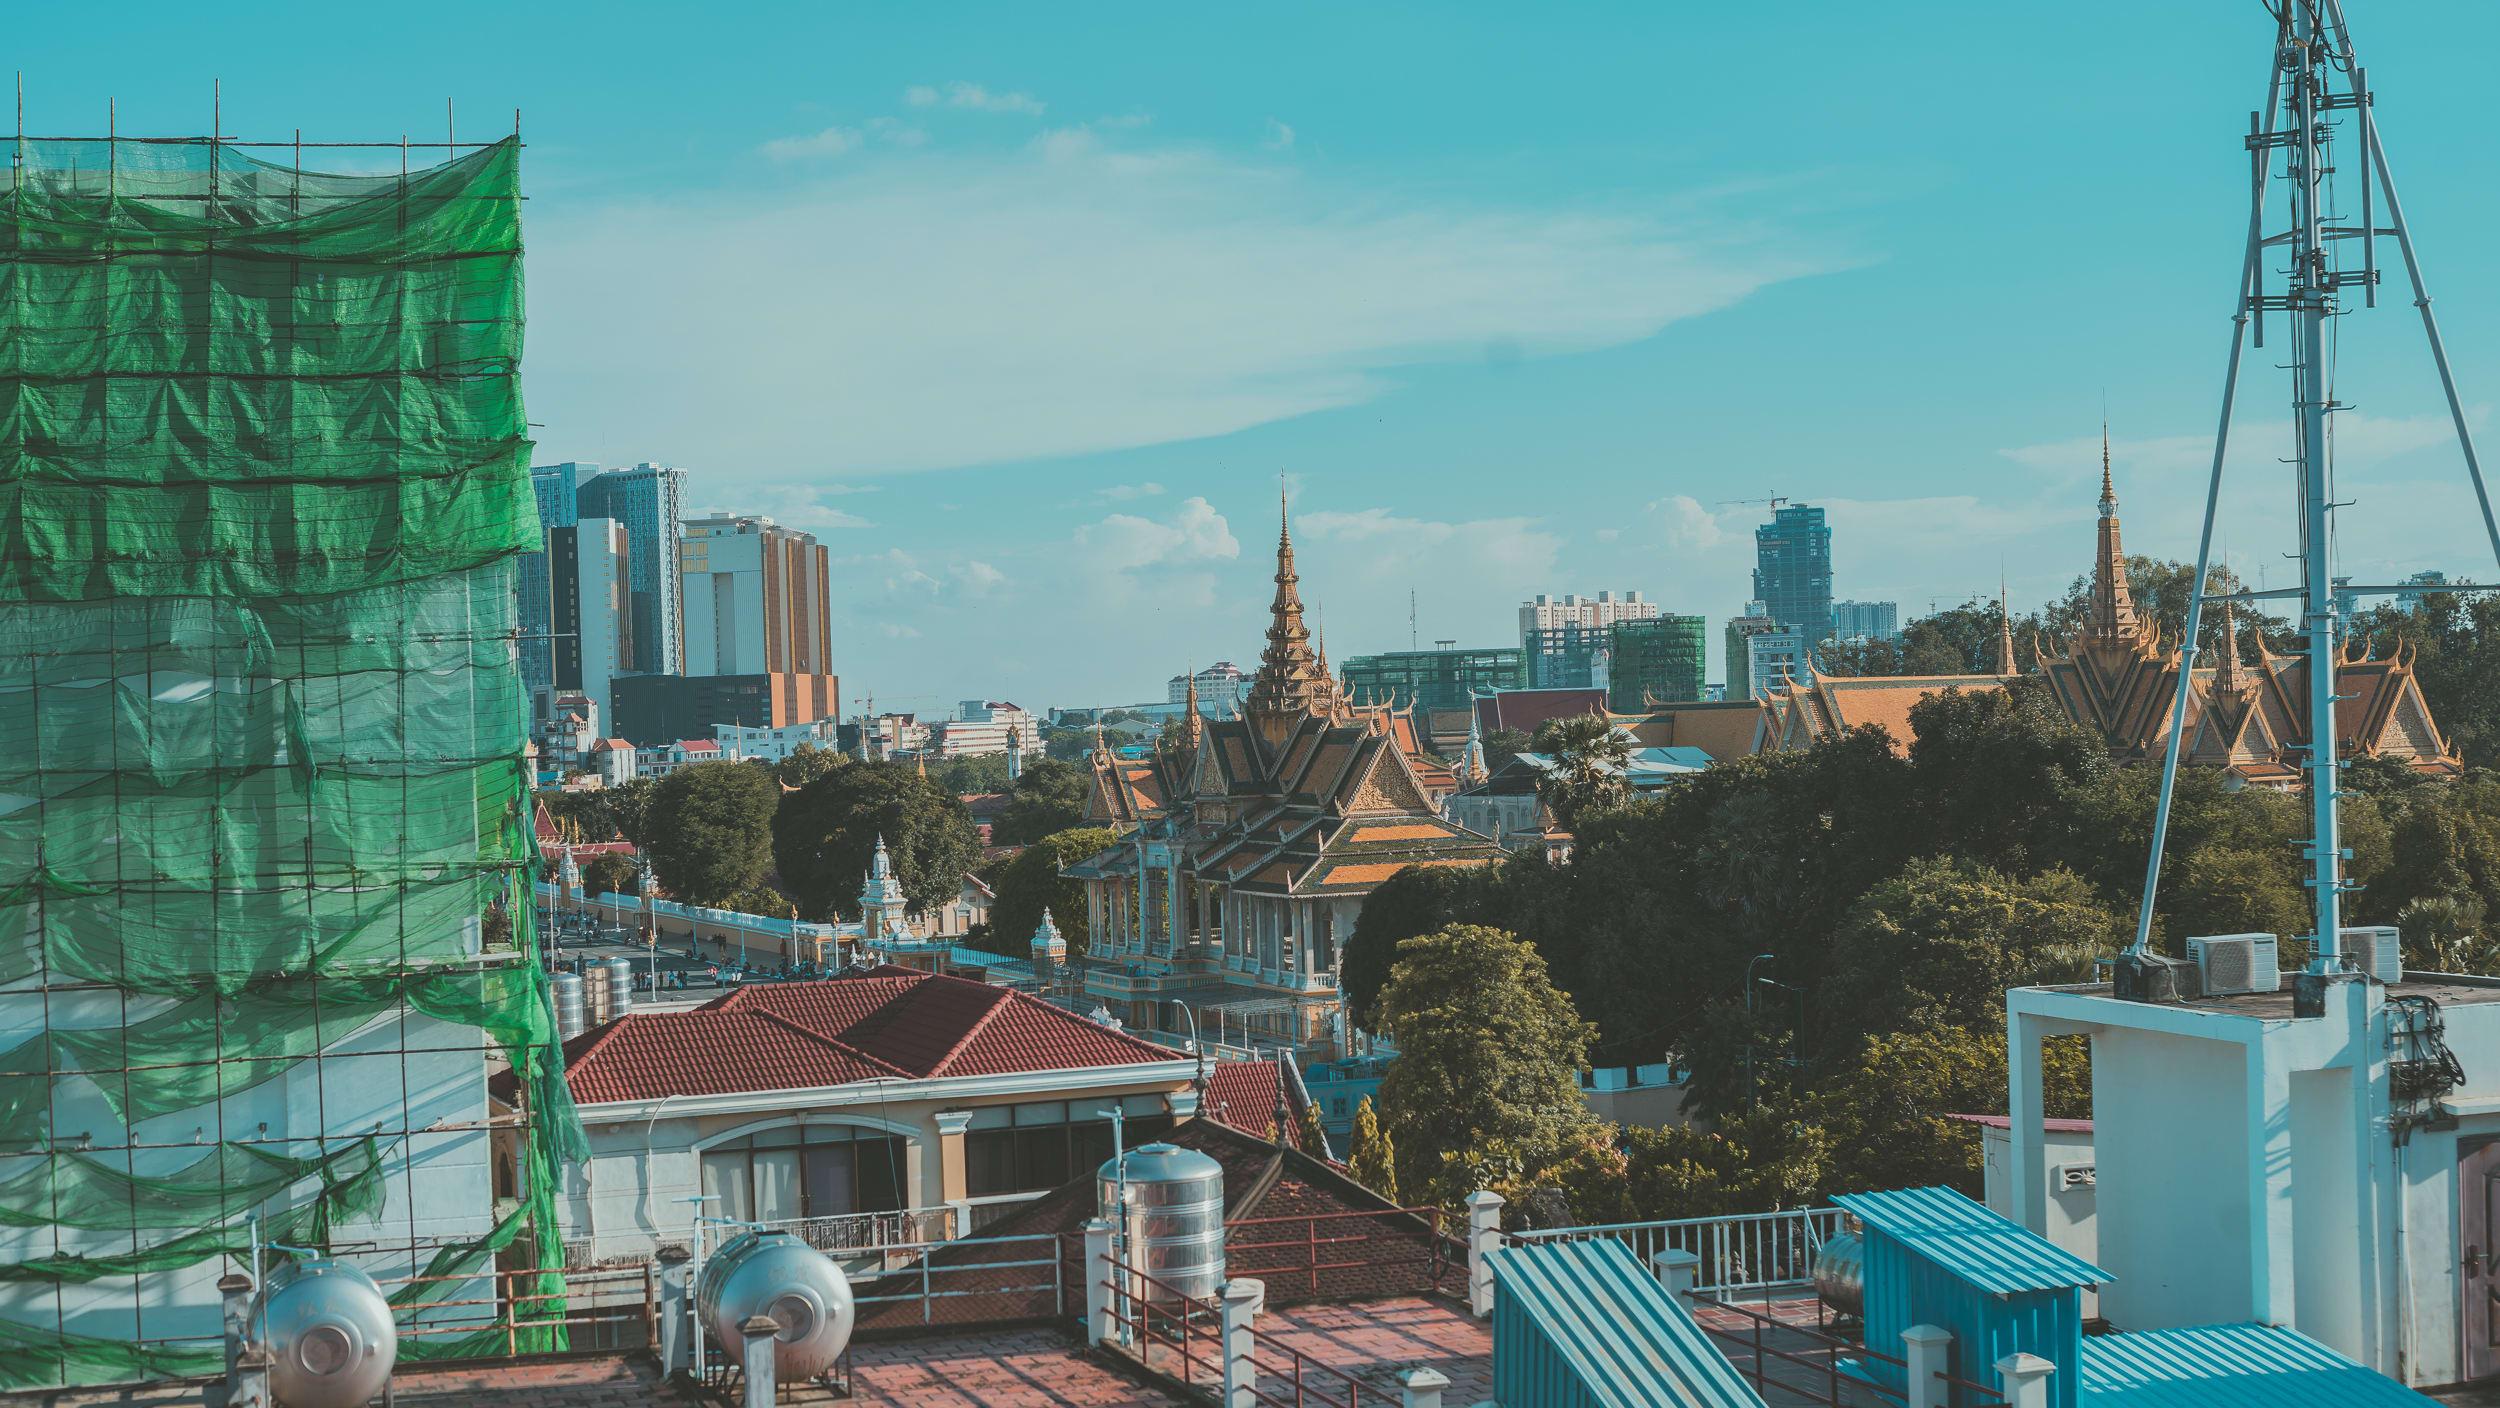 HOSTEL - Panorama Mekong Hostel